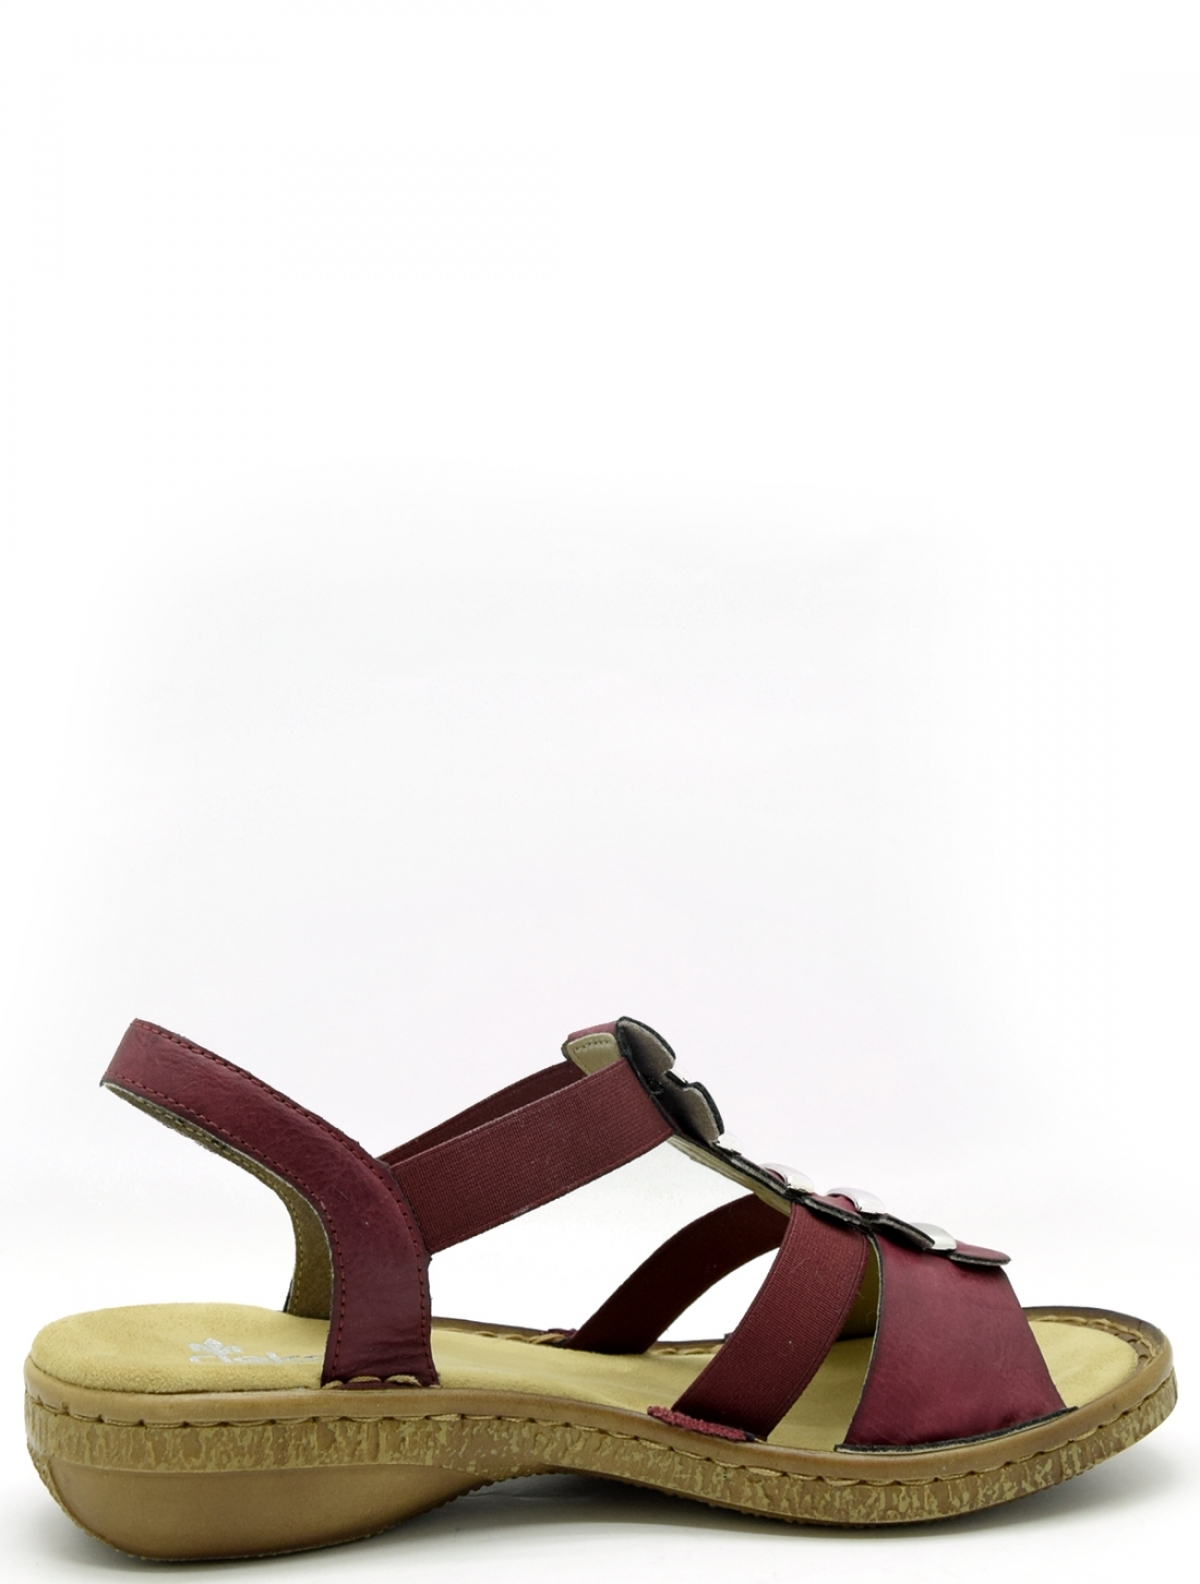 Rieker 62850-35 женские сандали